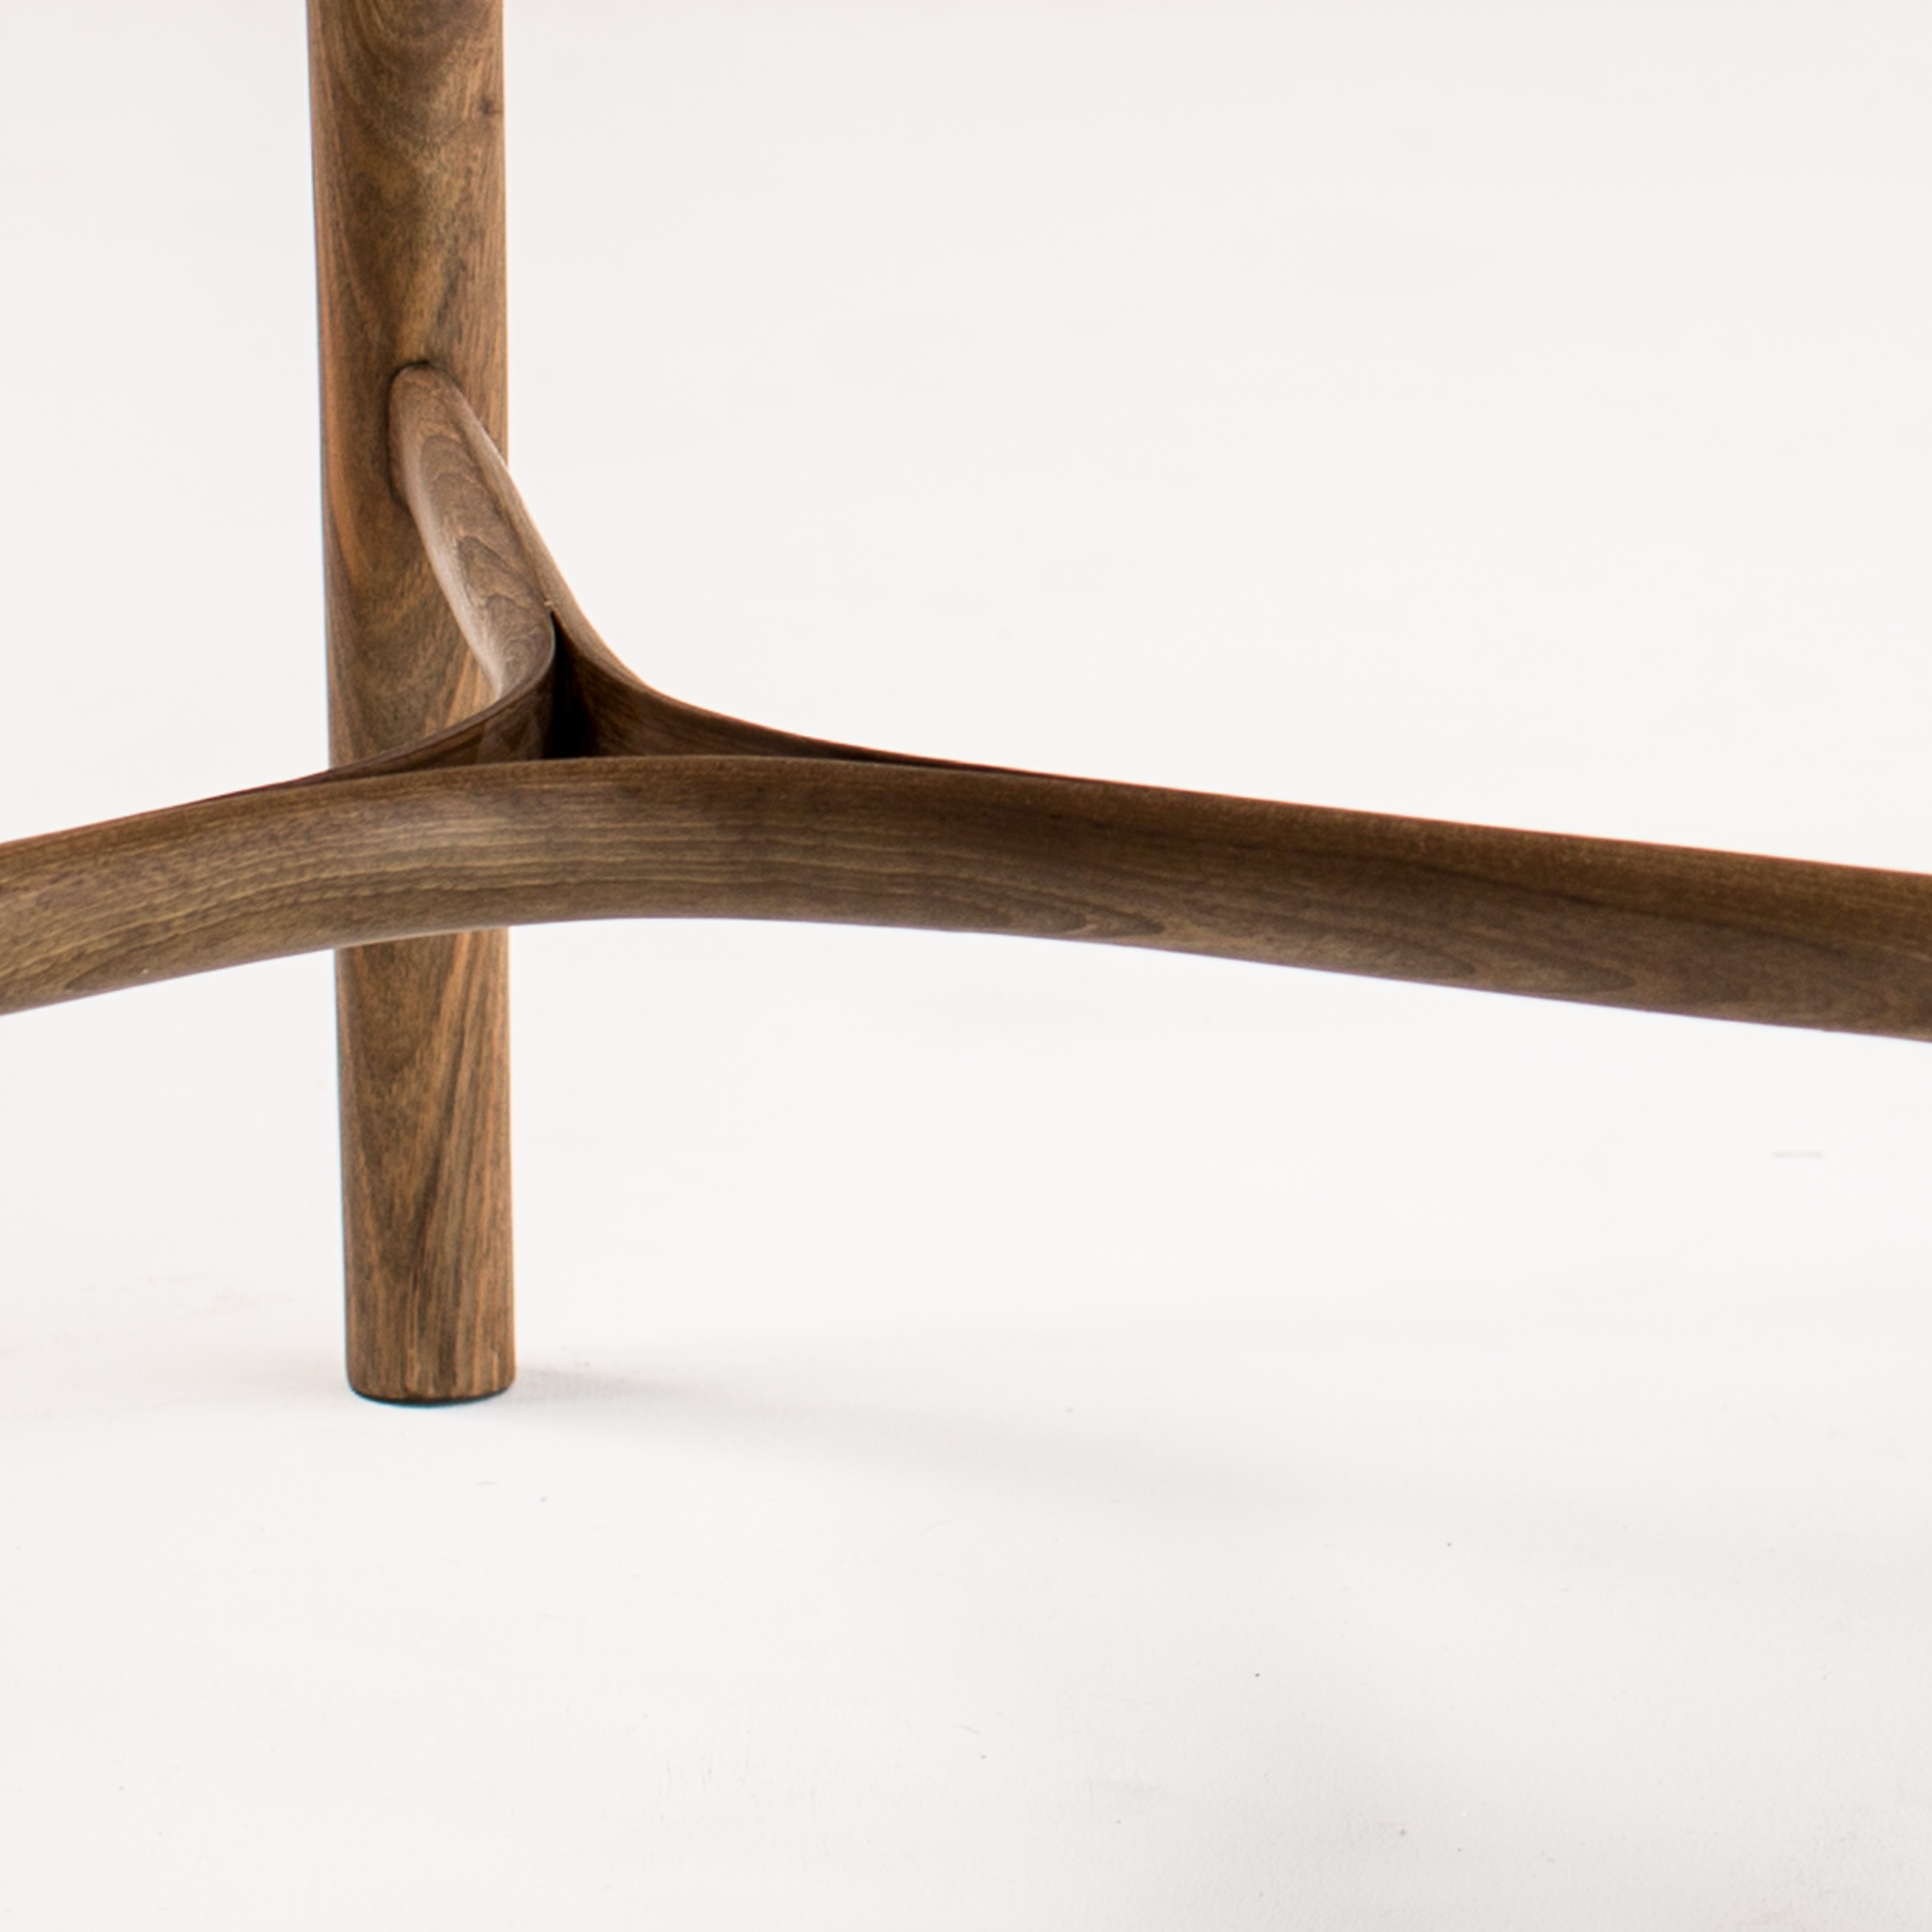 walnut coffe table-2.jpg